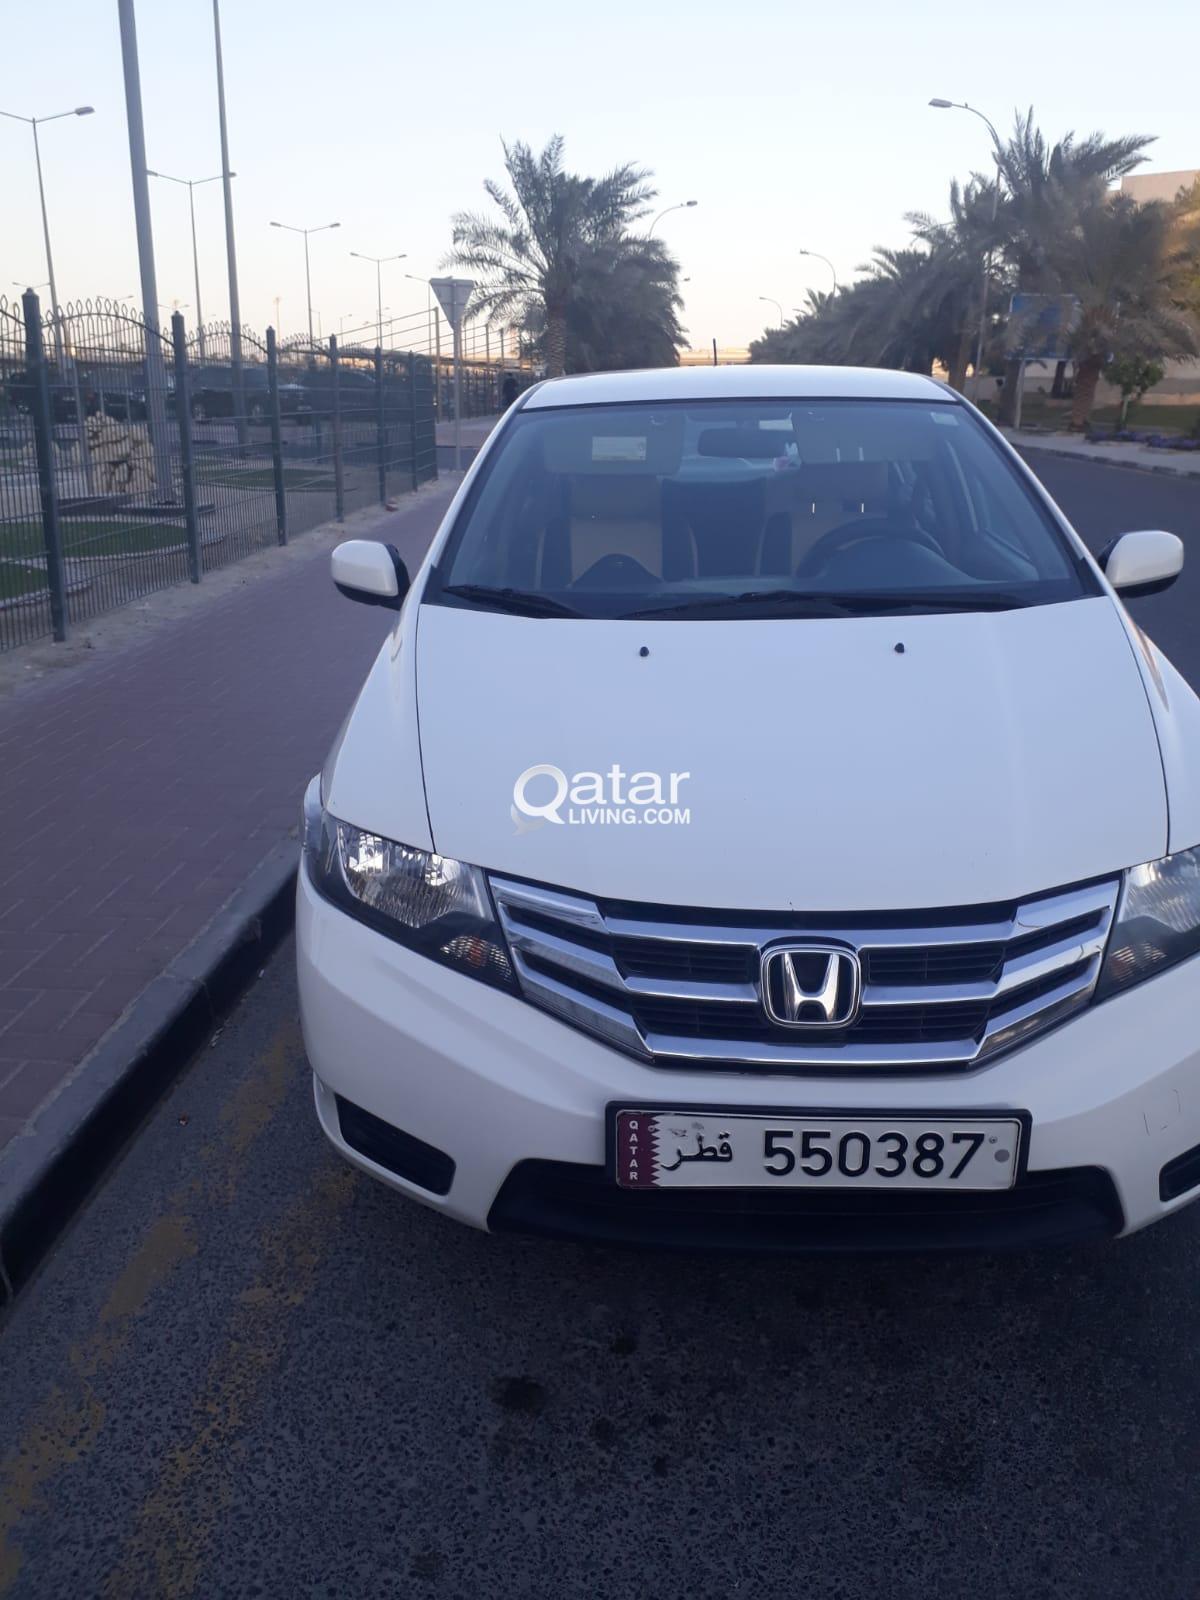 Honda City Car Model Available For Sale Qatar Living